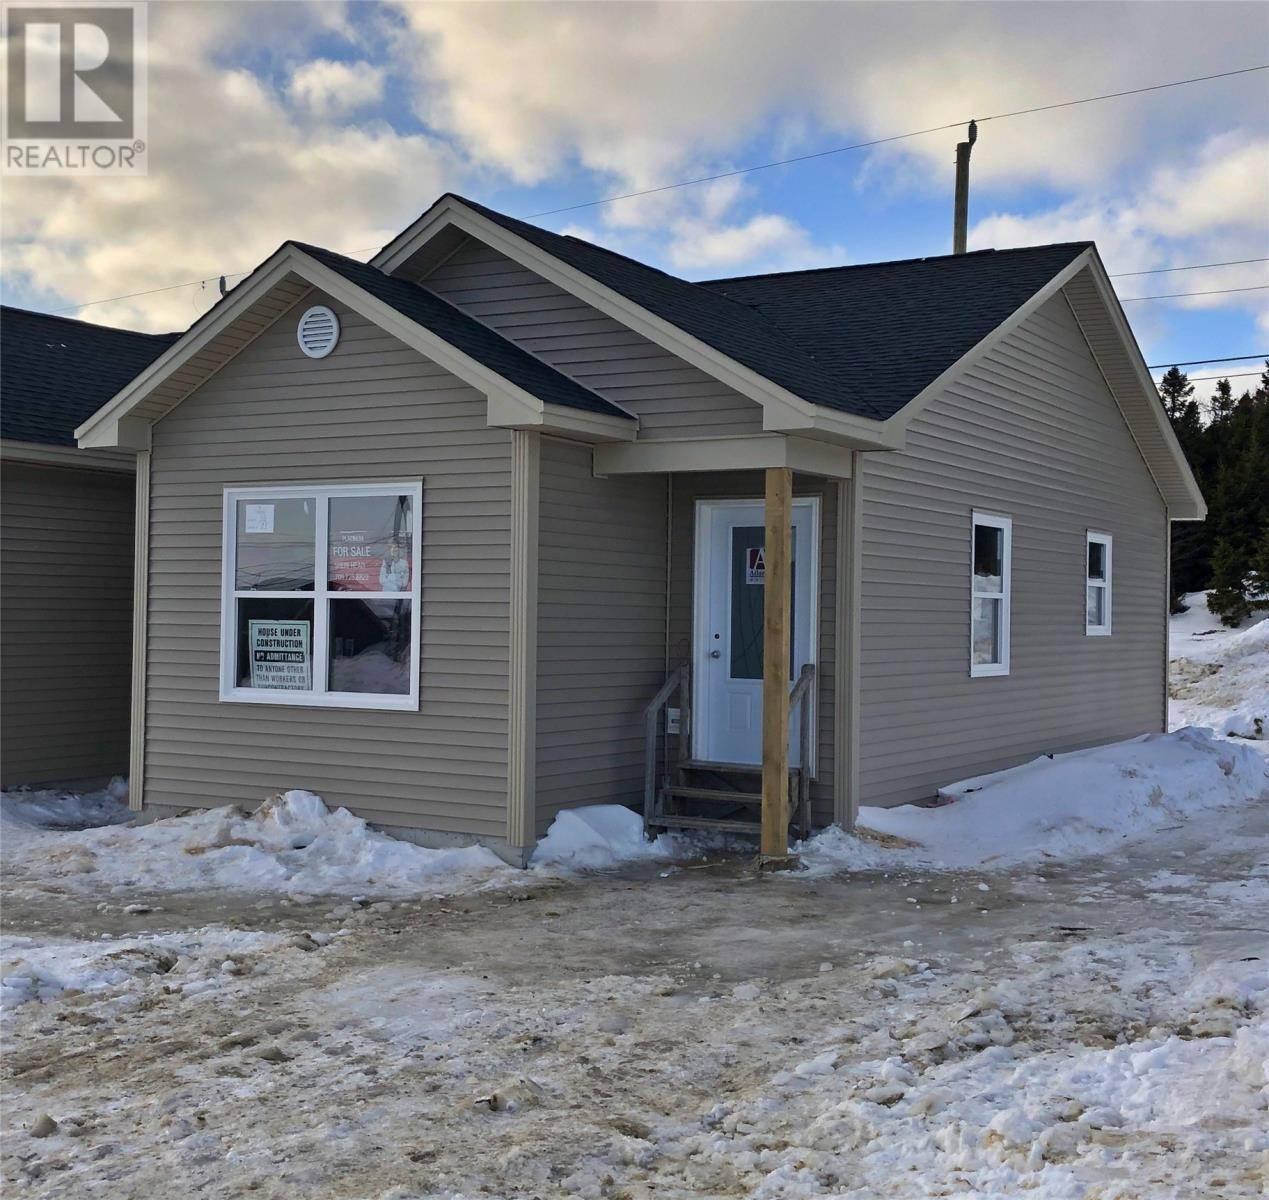 House for sale at 11 Larsen St Mount Pearl Newfoundland - MLS: 1207416